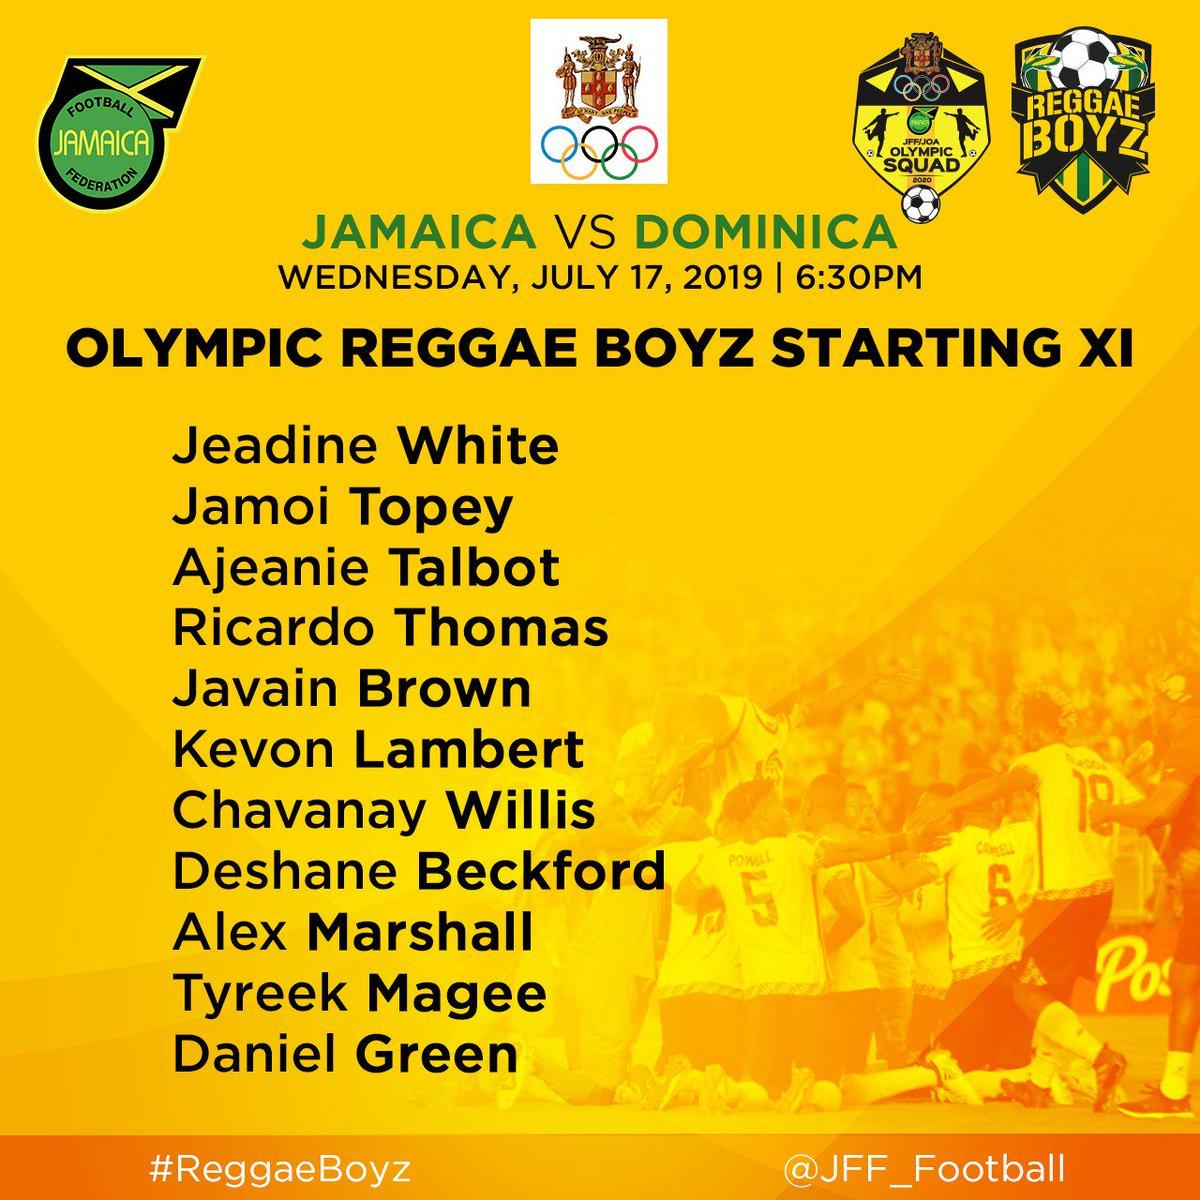 || Matchday 🇯🇲 vs 🇩🇲 || Under 23 #ReggaeBoyz starting XI for their game against Dominica! ||#OlympicQualifiers 🏆 Matchtime: 6:30 pm(JA Time)  #JFFLive #ReggaeBoyz #ReggaeFootball #StillOnTheBall